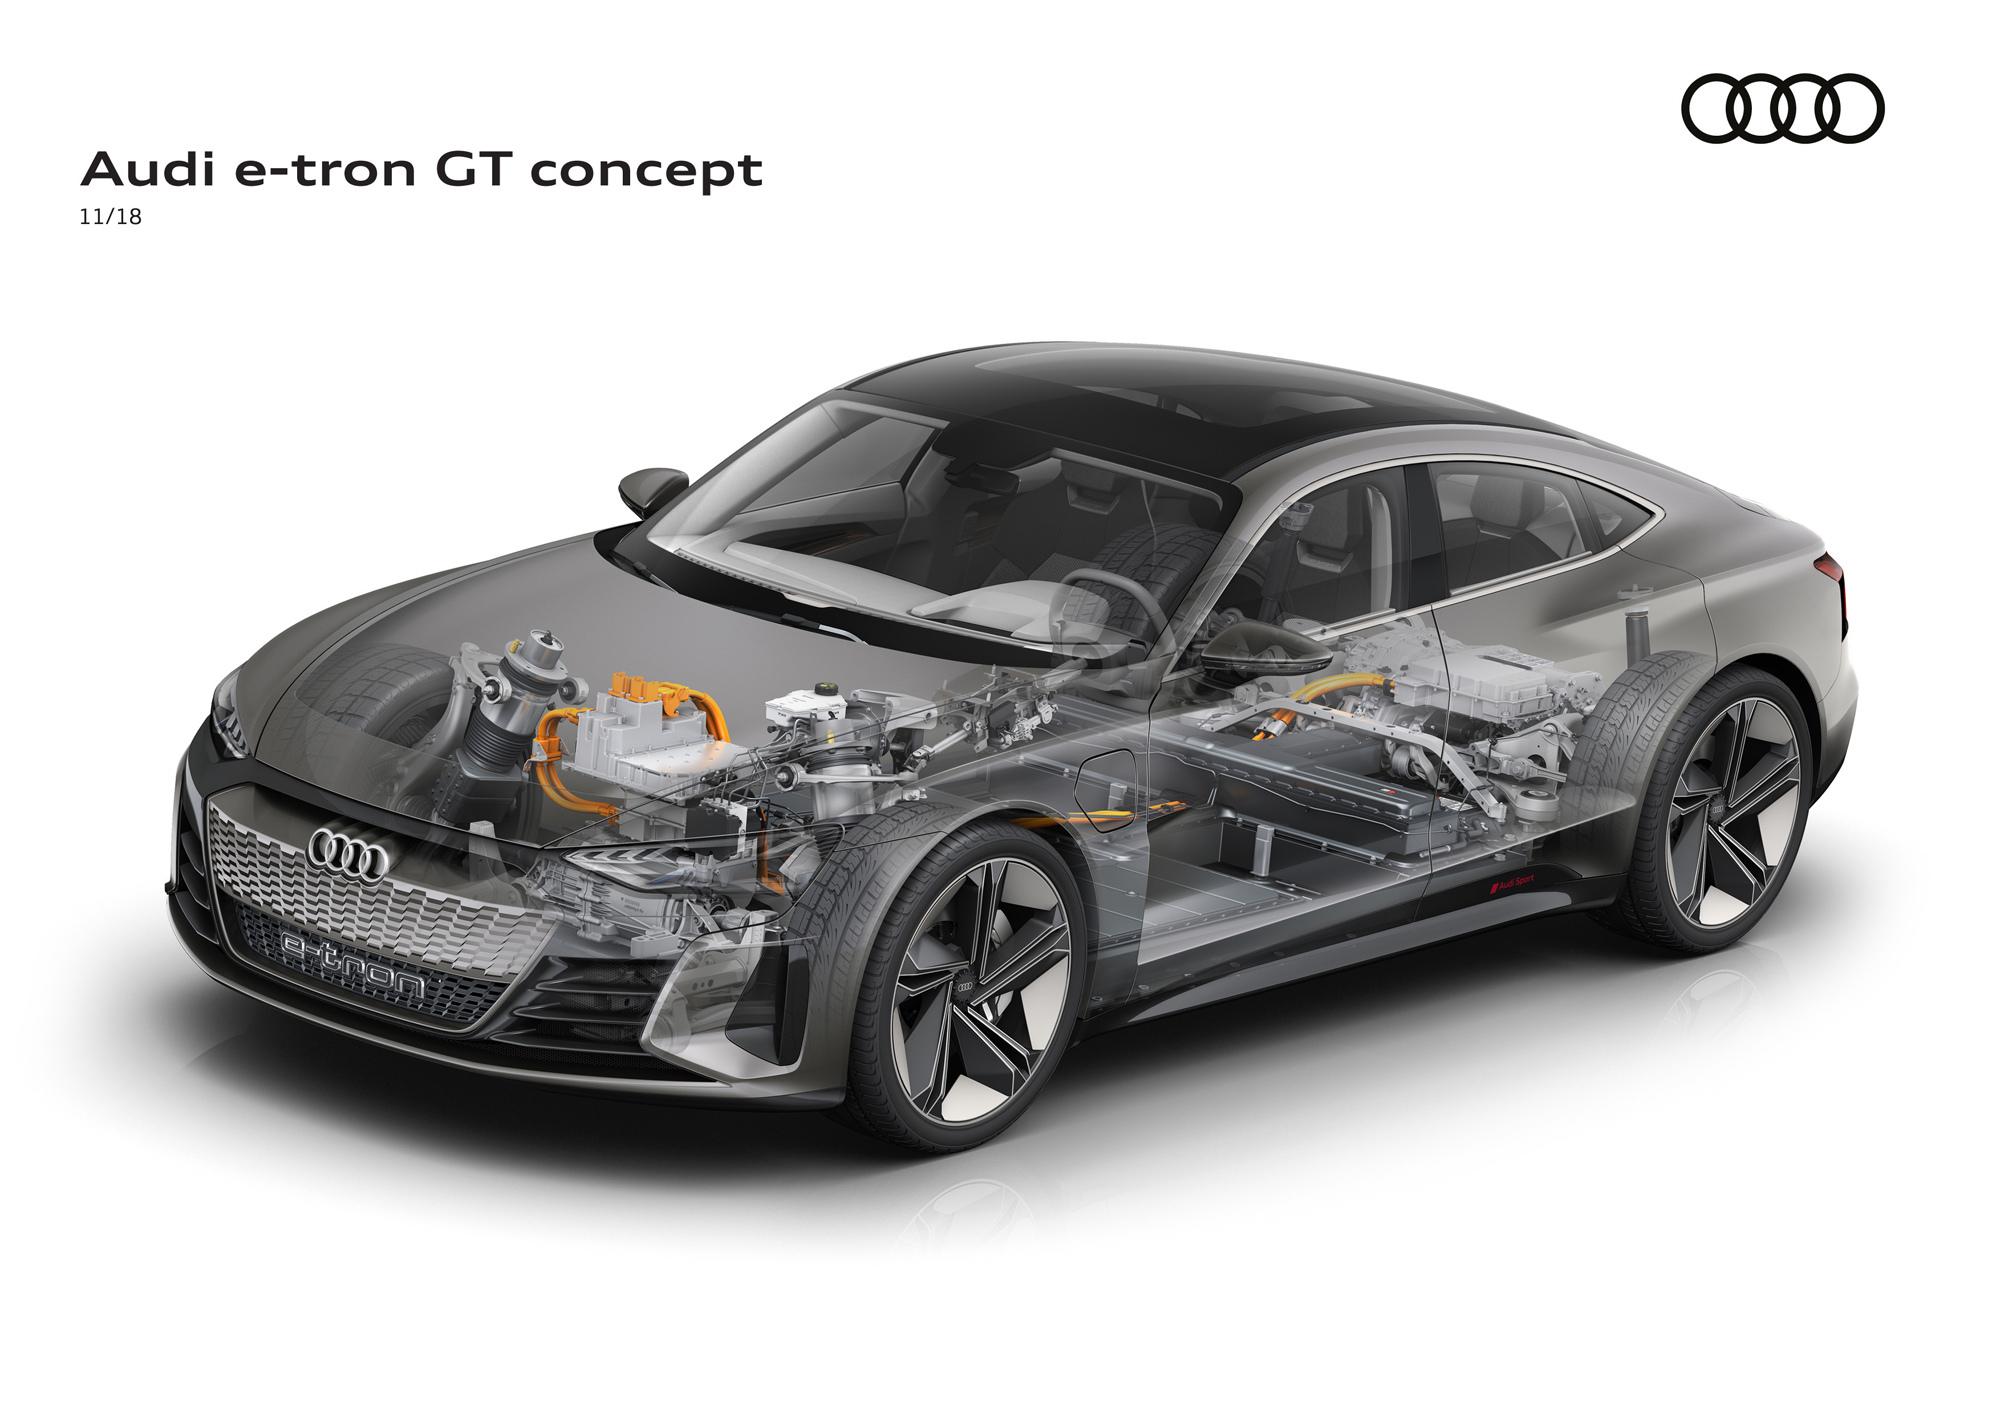 концепт Audi E Tron Gt приготовился к путешествиям драйв